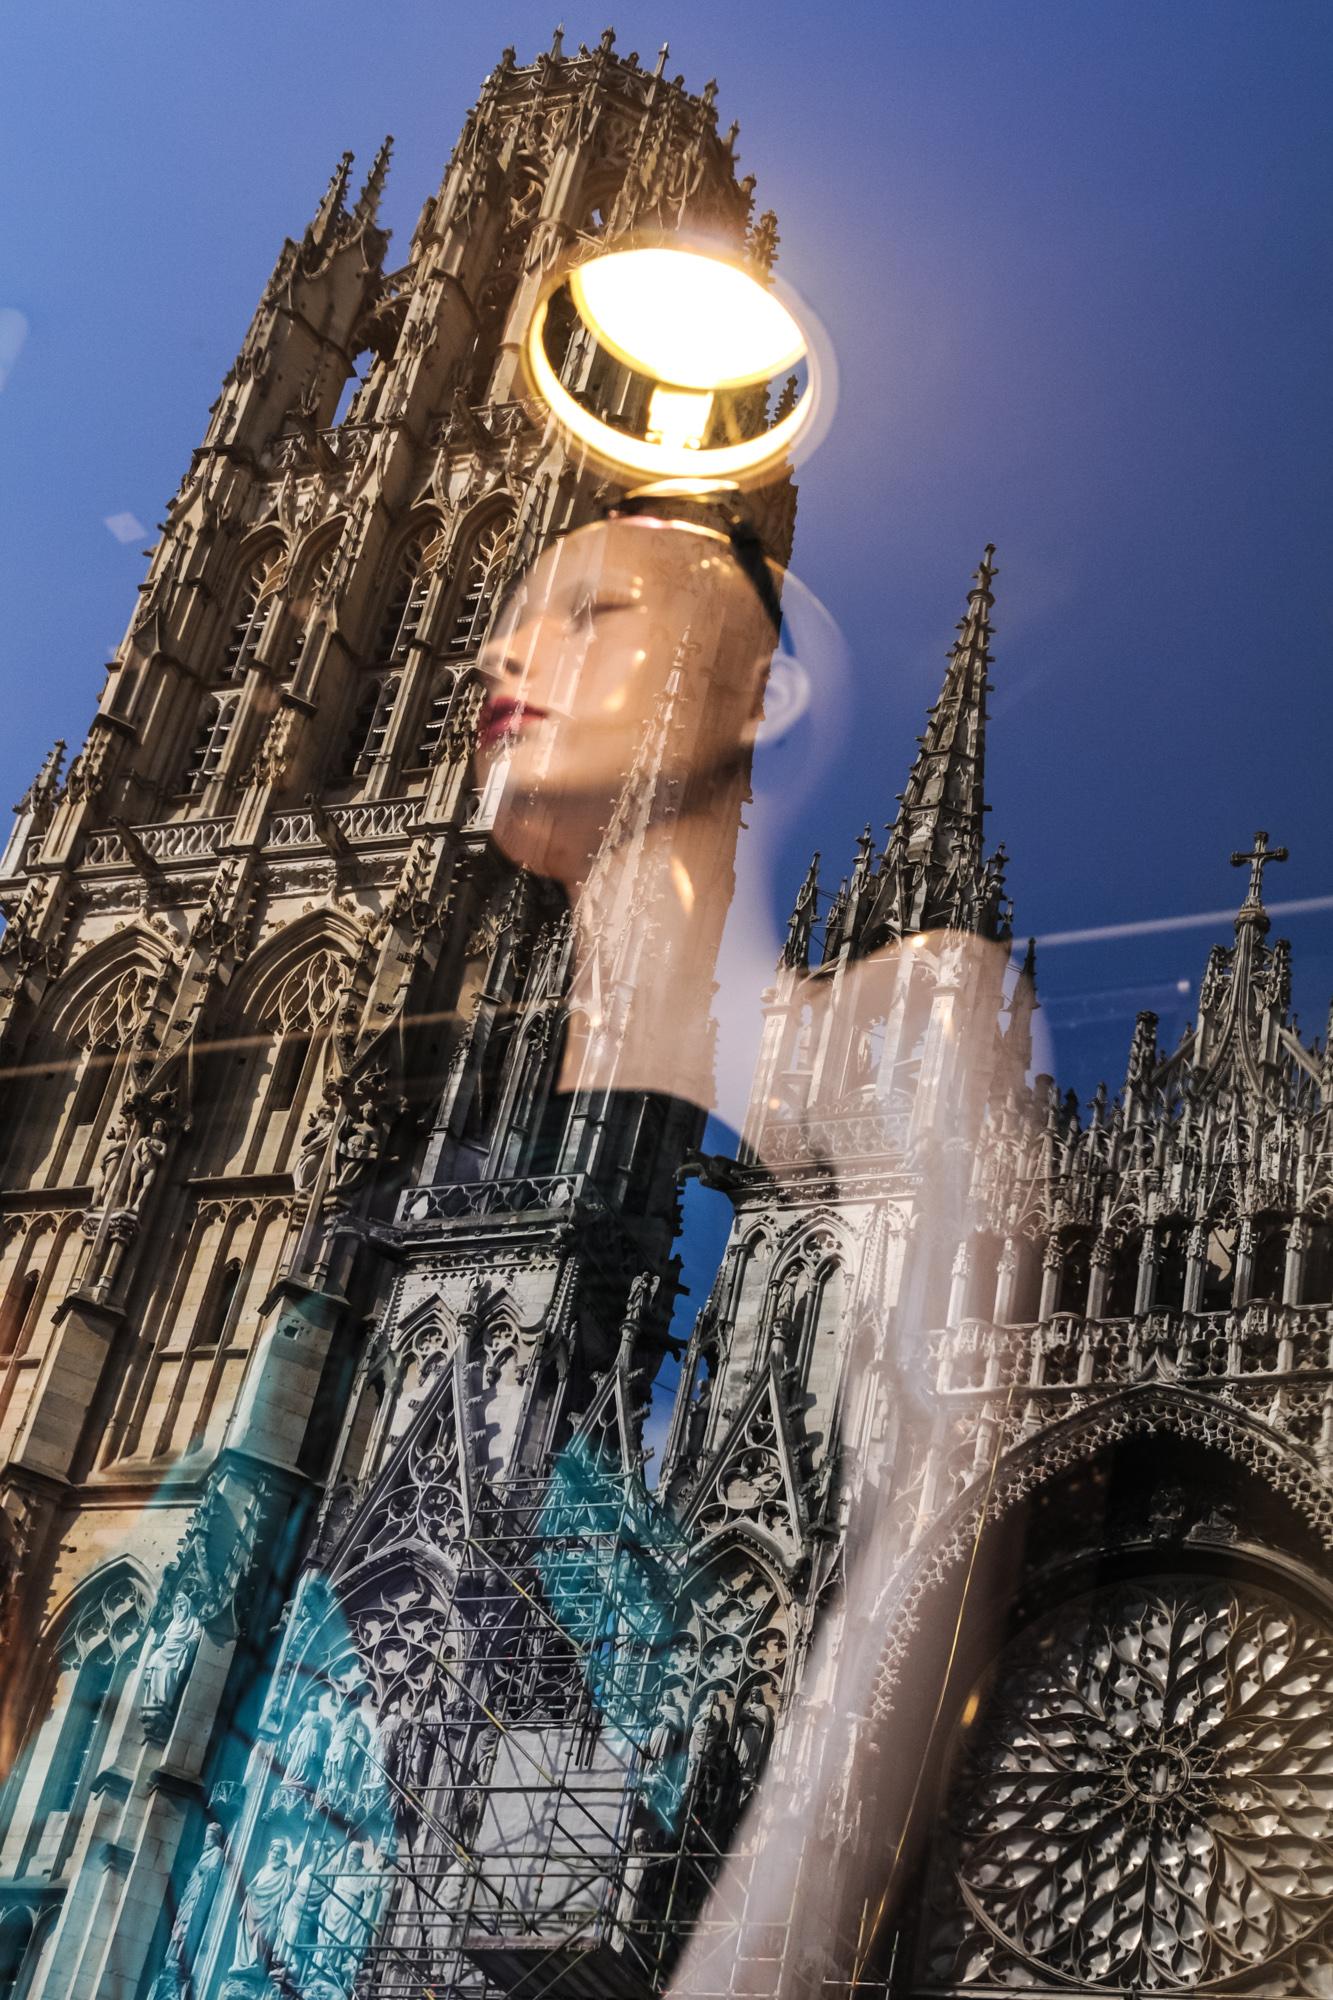 Angelic (Rouen, France)